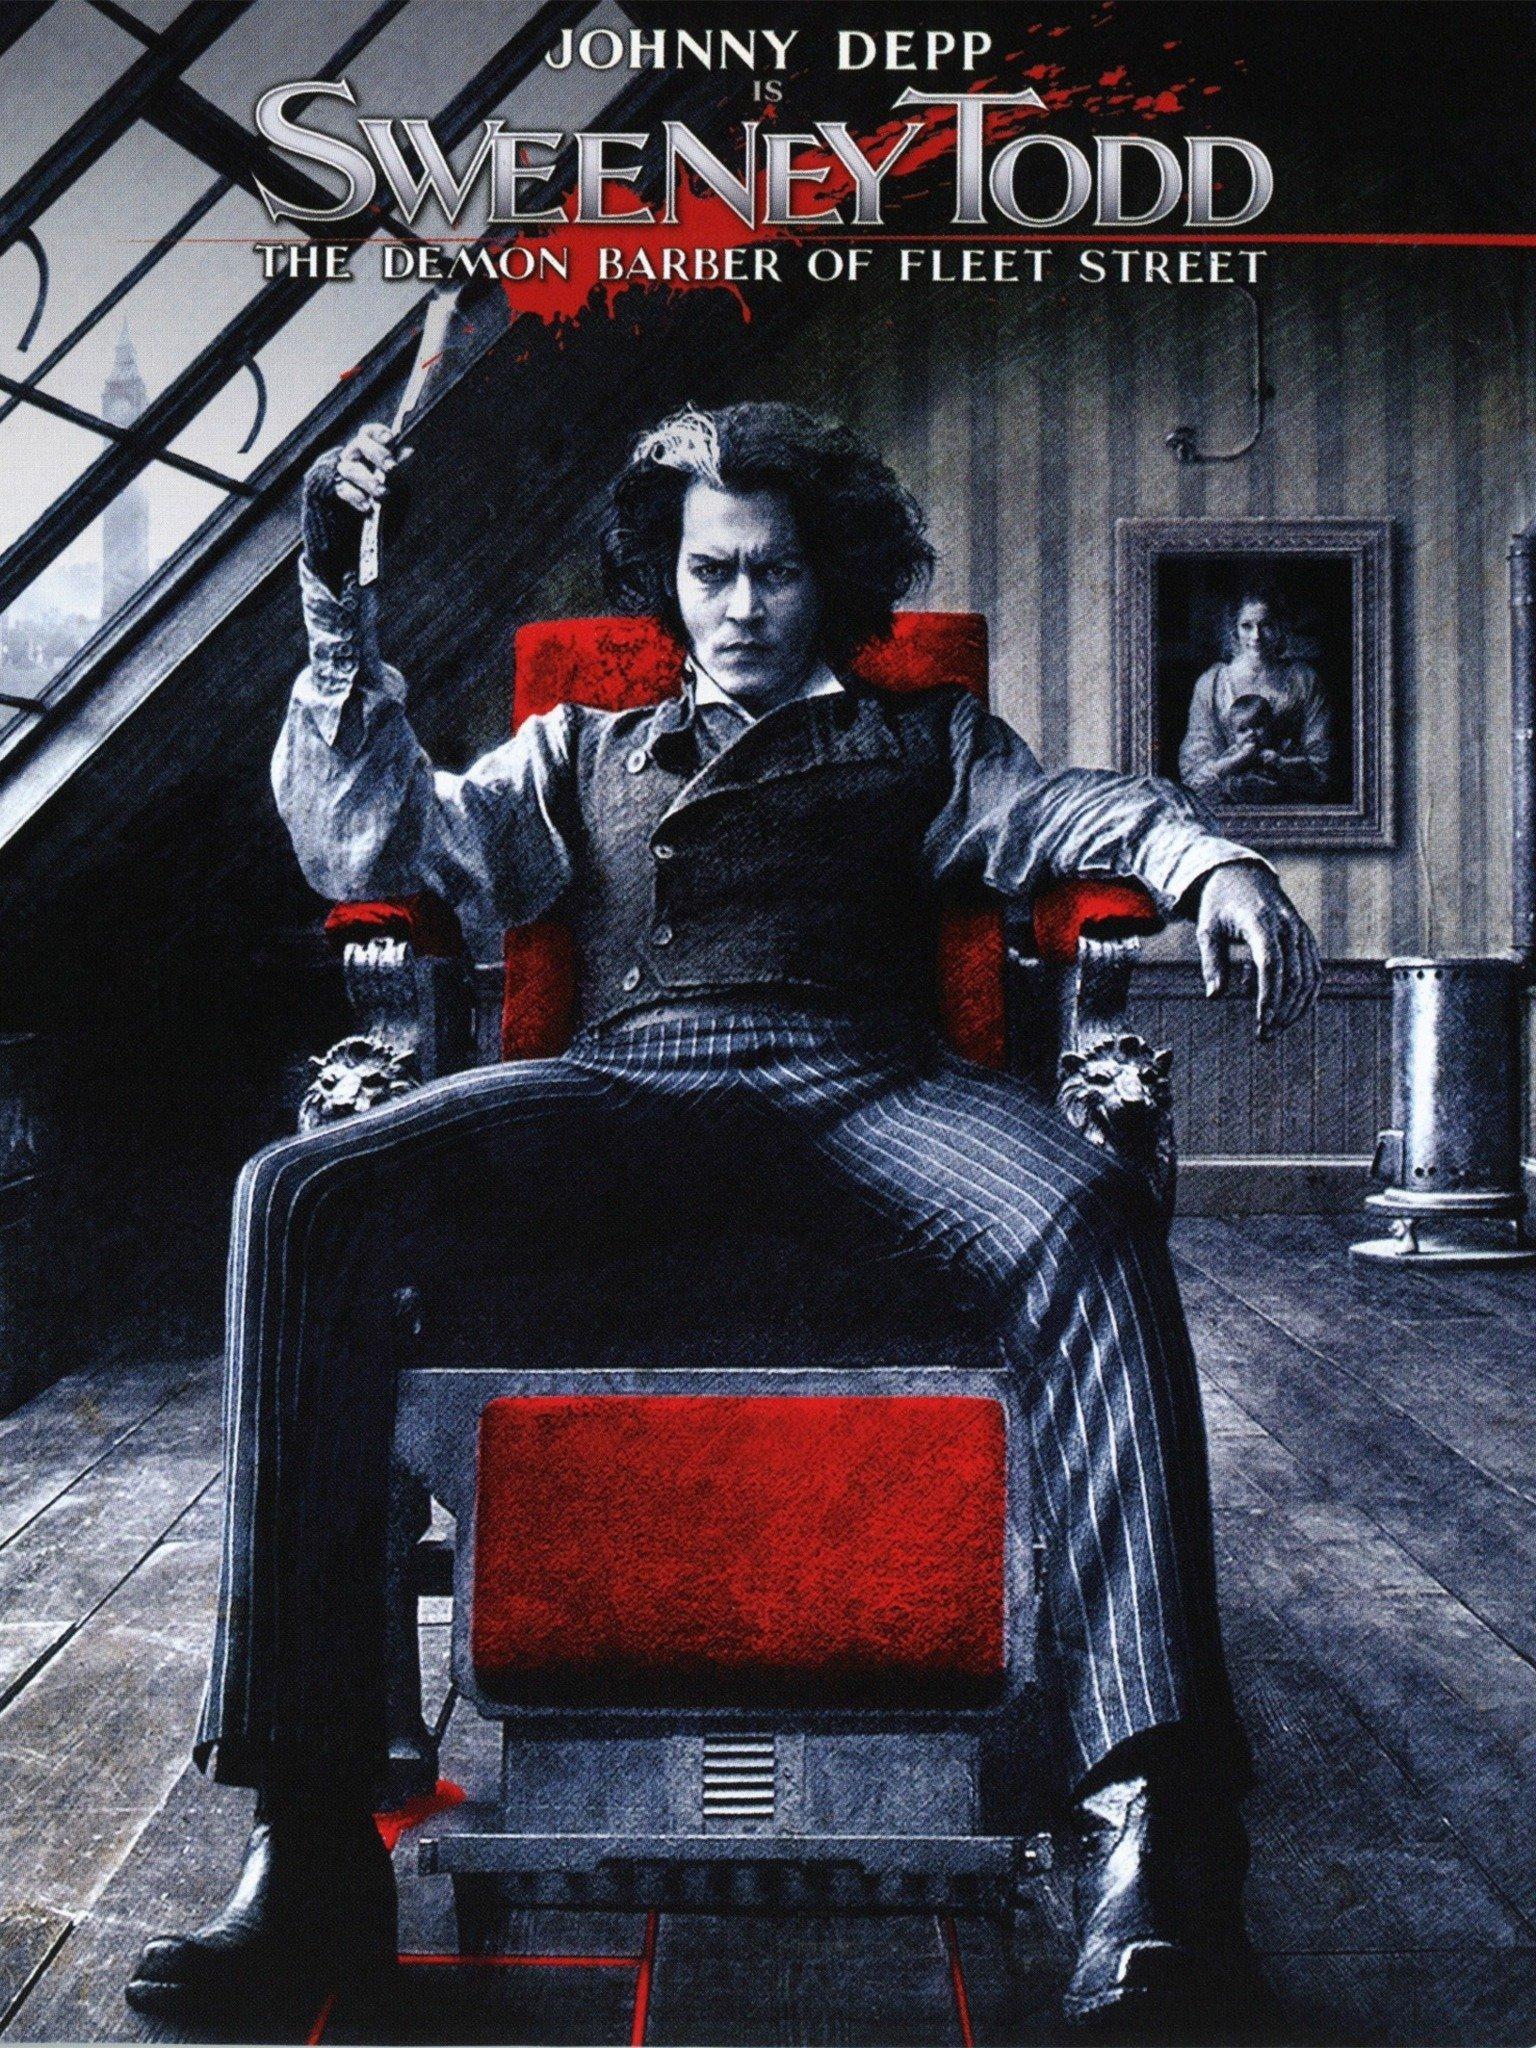 Sweeney Todd The Demon Barber Of Fleet Street 2007 Rotten Tomatoes